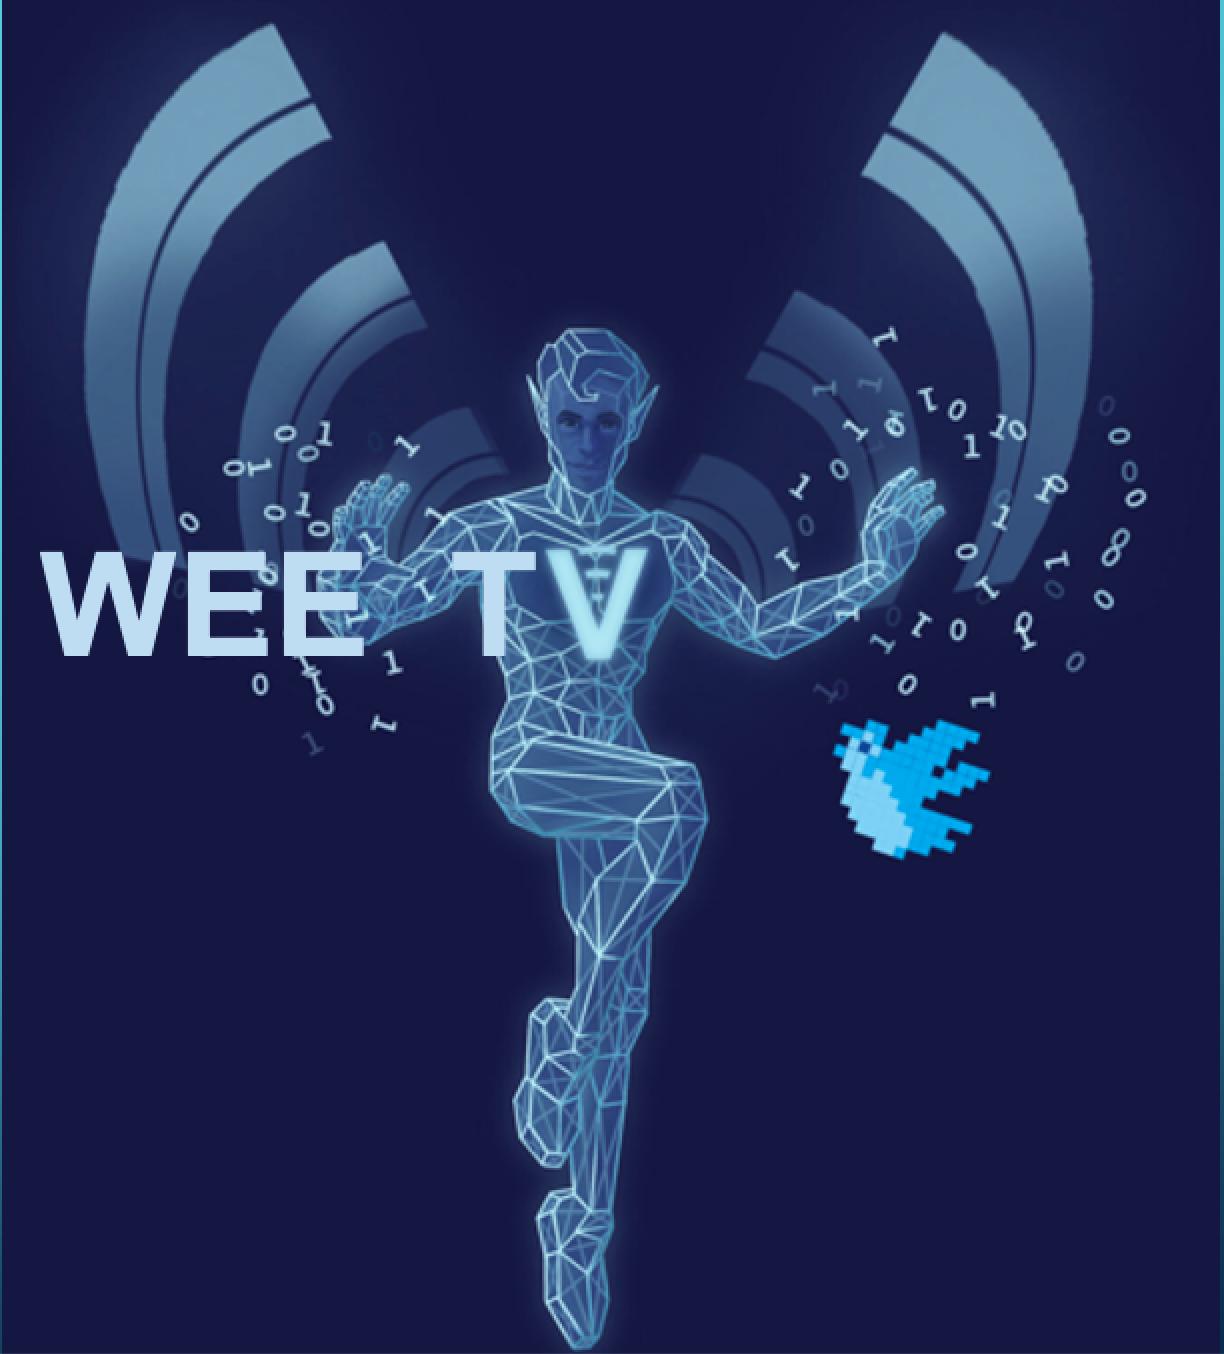 Wee TV